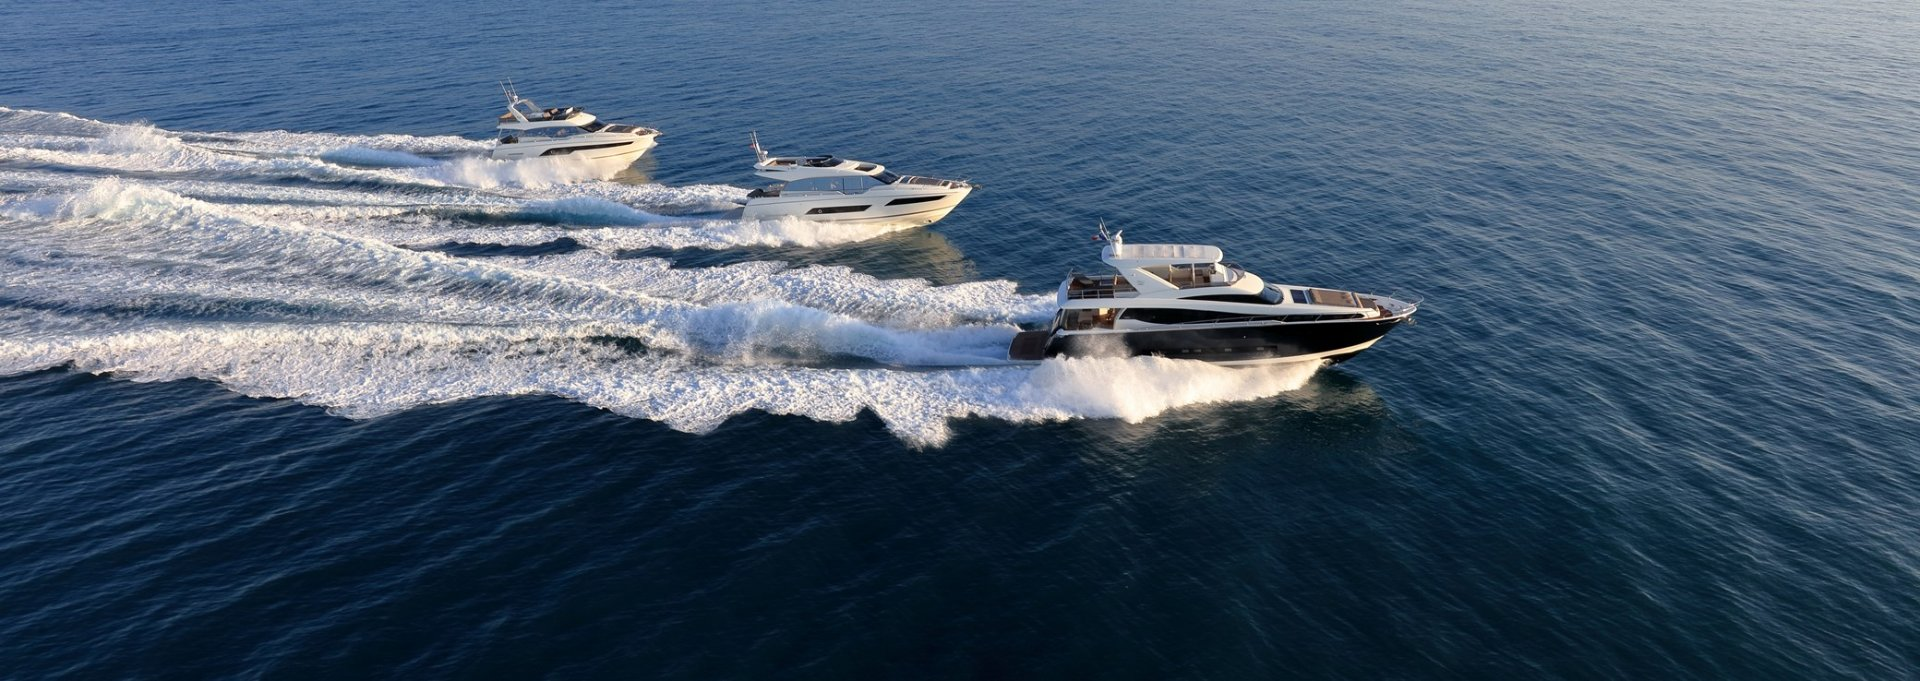 prestige-yachts-range_p630-p680s-p750-16